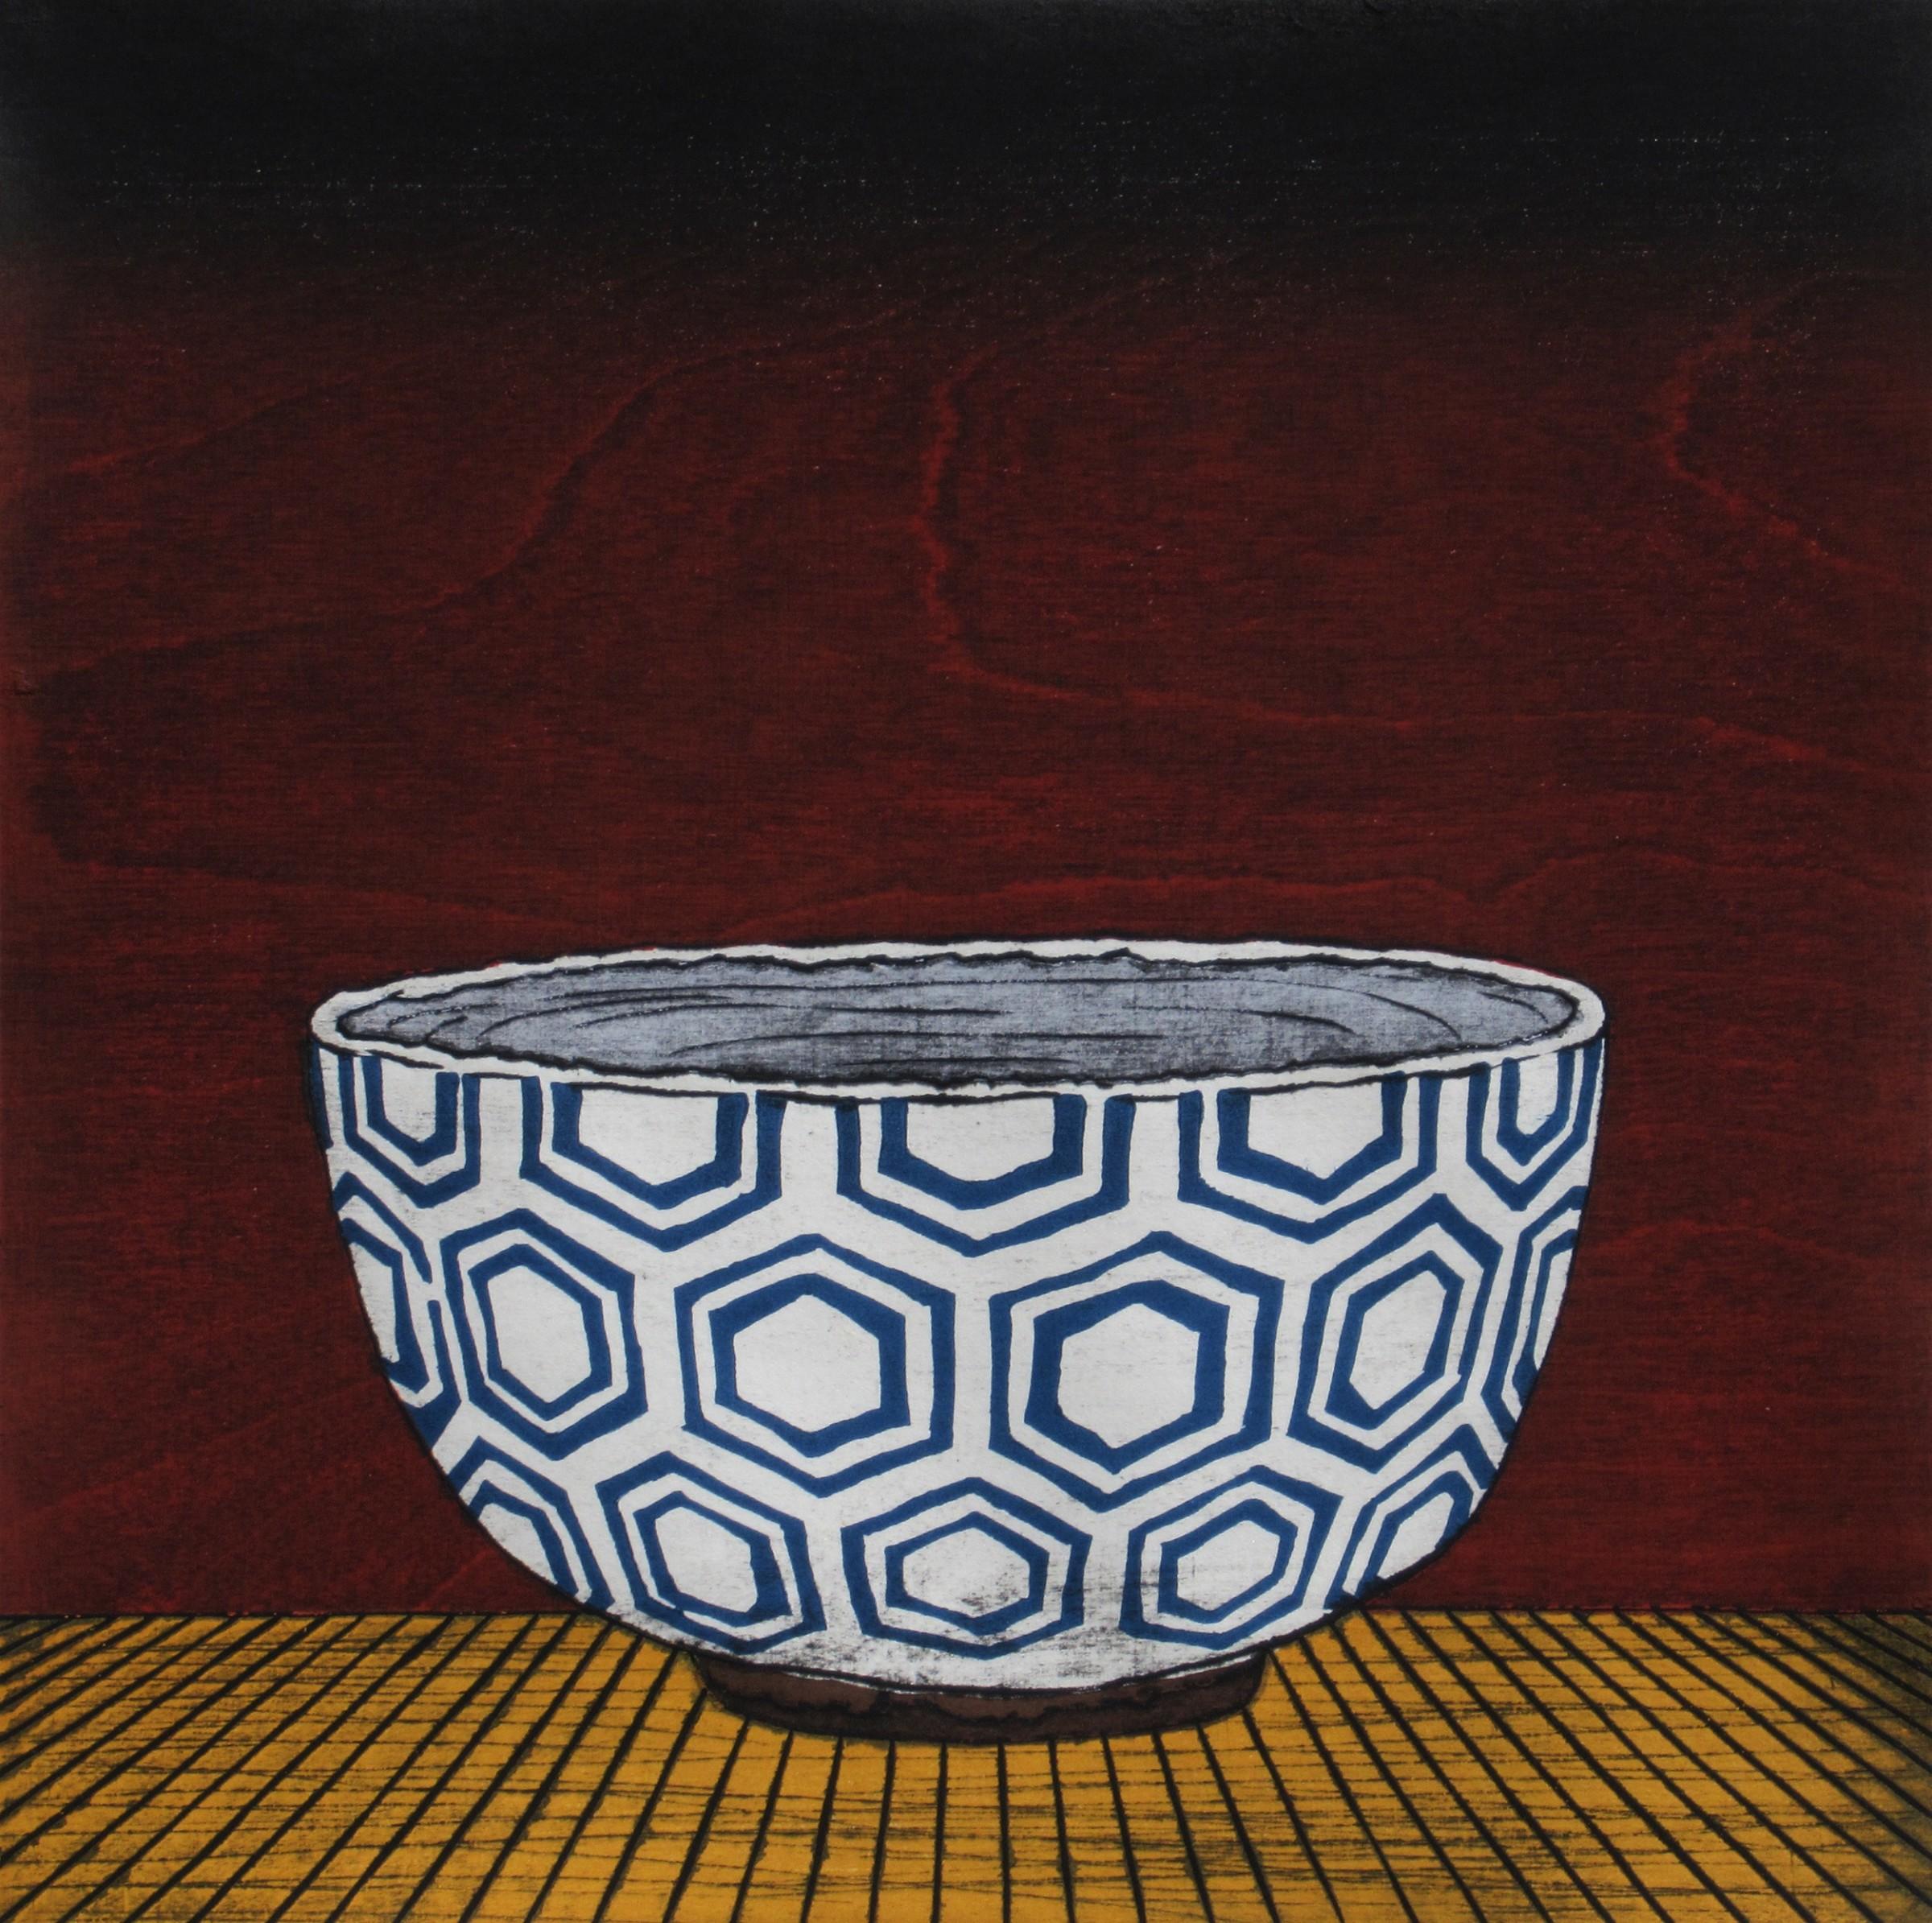 "<span class=""link fancybox-details-link""><a href=""/exhibitions/21/works/artworks_standalone10890/"">View Detail Page</a></span><div class=""artist""><span class=""artist""><strong>Nana Shiomi RE</strong></span></div><div class=""title""><em>White Hexagon Tea Bowl</em></div><div class=""medium"">woodcut</div><div class=""dimensions"">45 x 45cm framed<br>30 x 30cm unframed</div><div class=""edition_details"">edition of 30</div>"